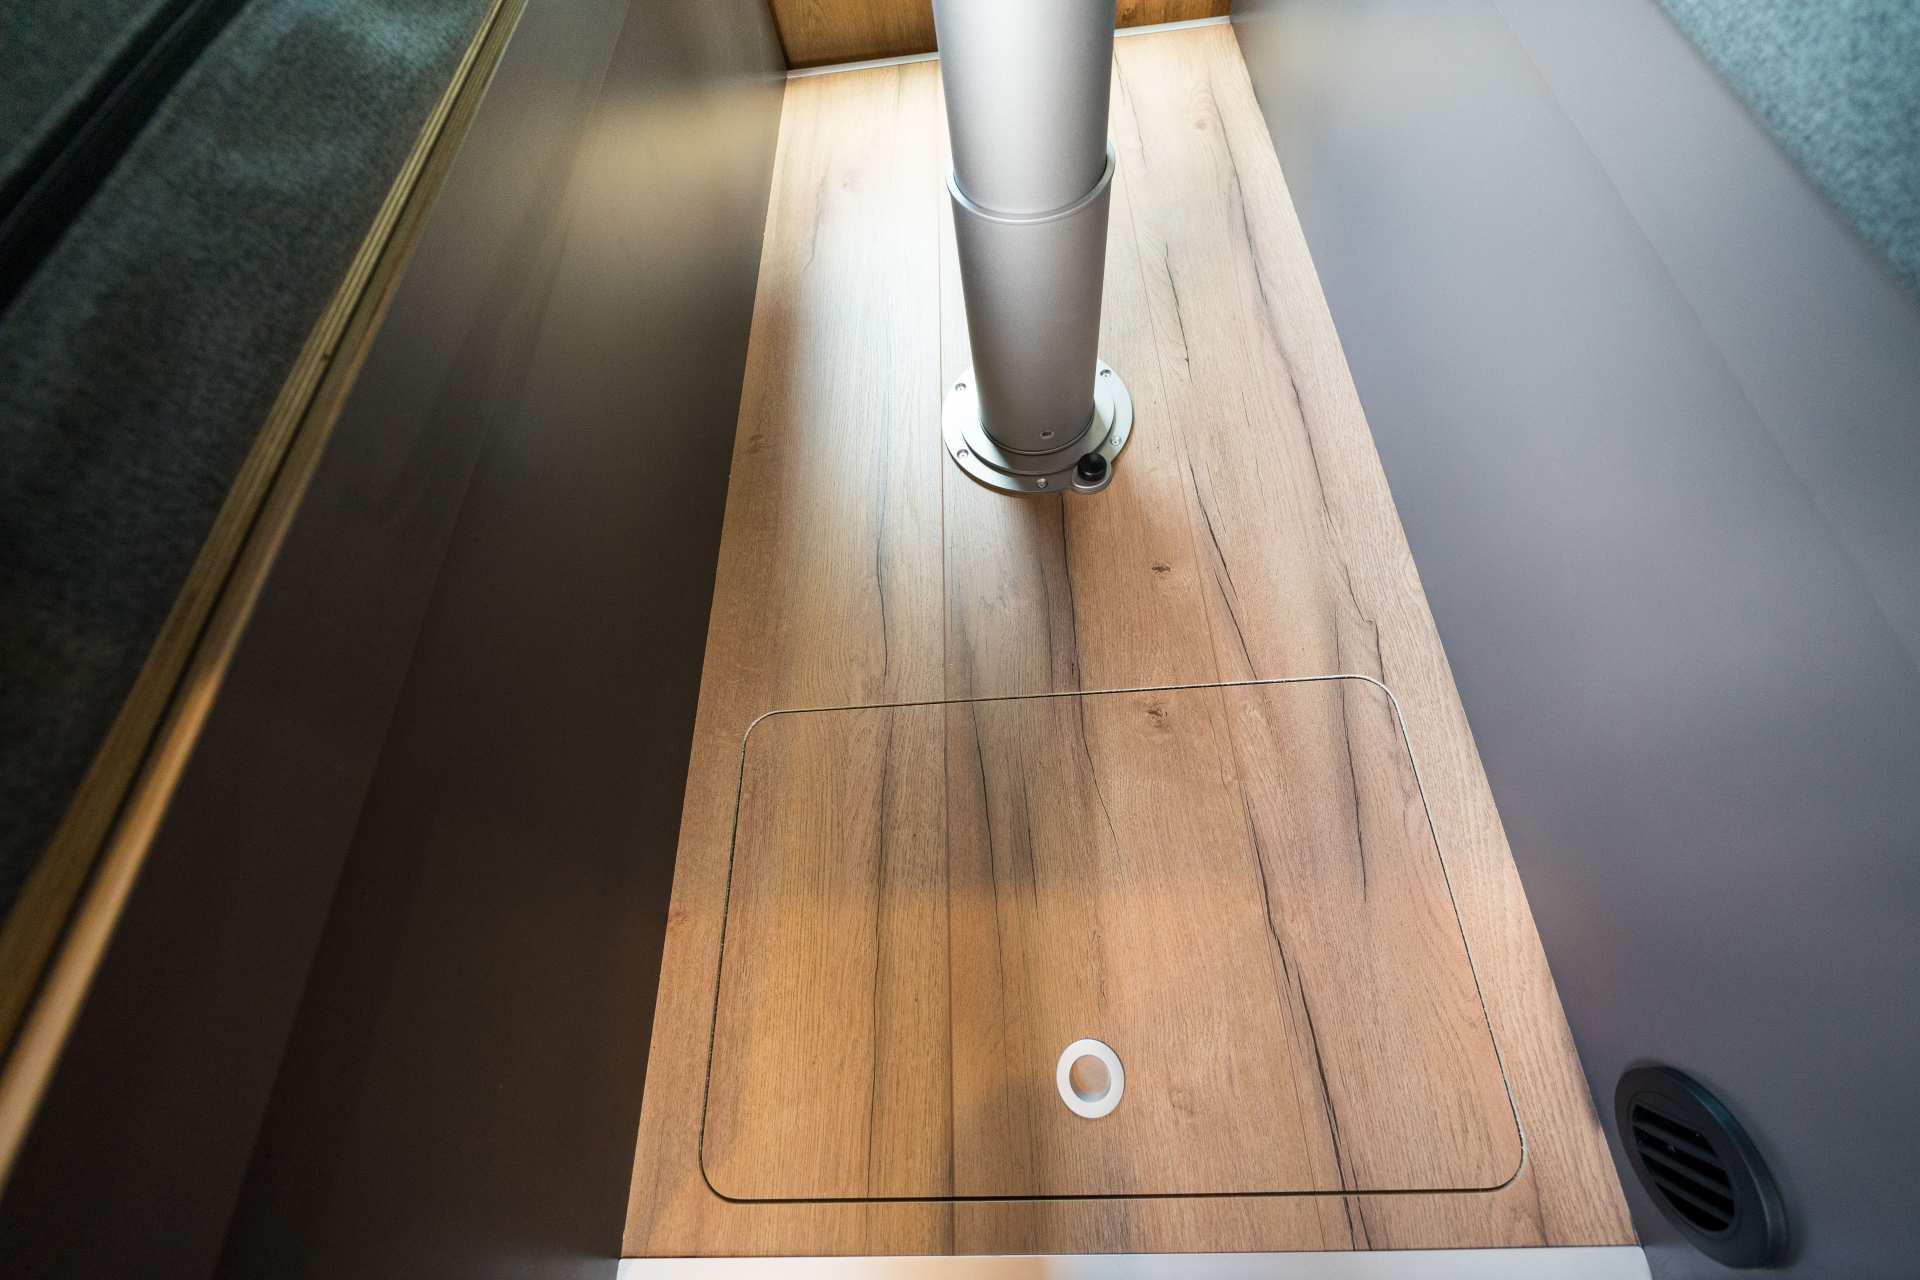 Individualausbau: Zwei-Raumwohnung Peugeot Boxer L2 H2 - 29